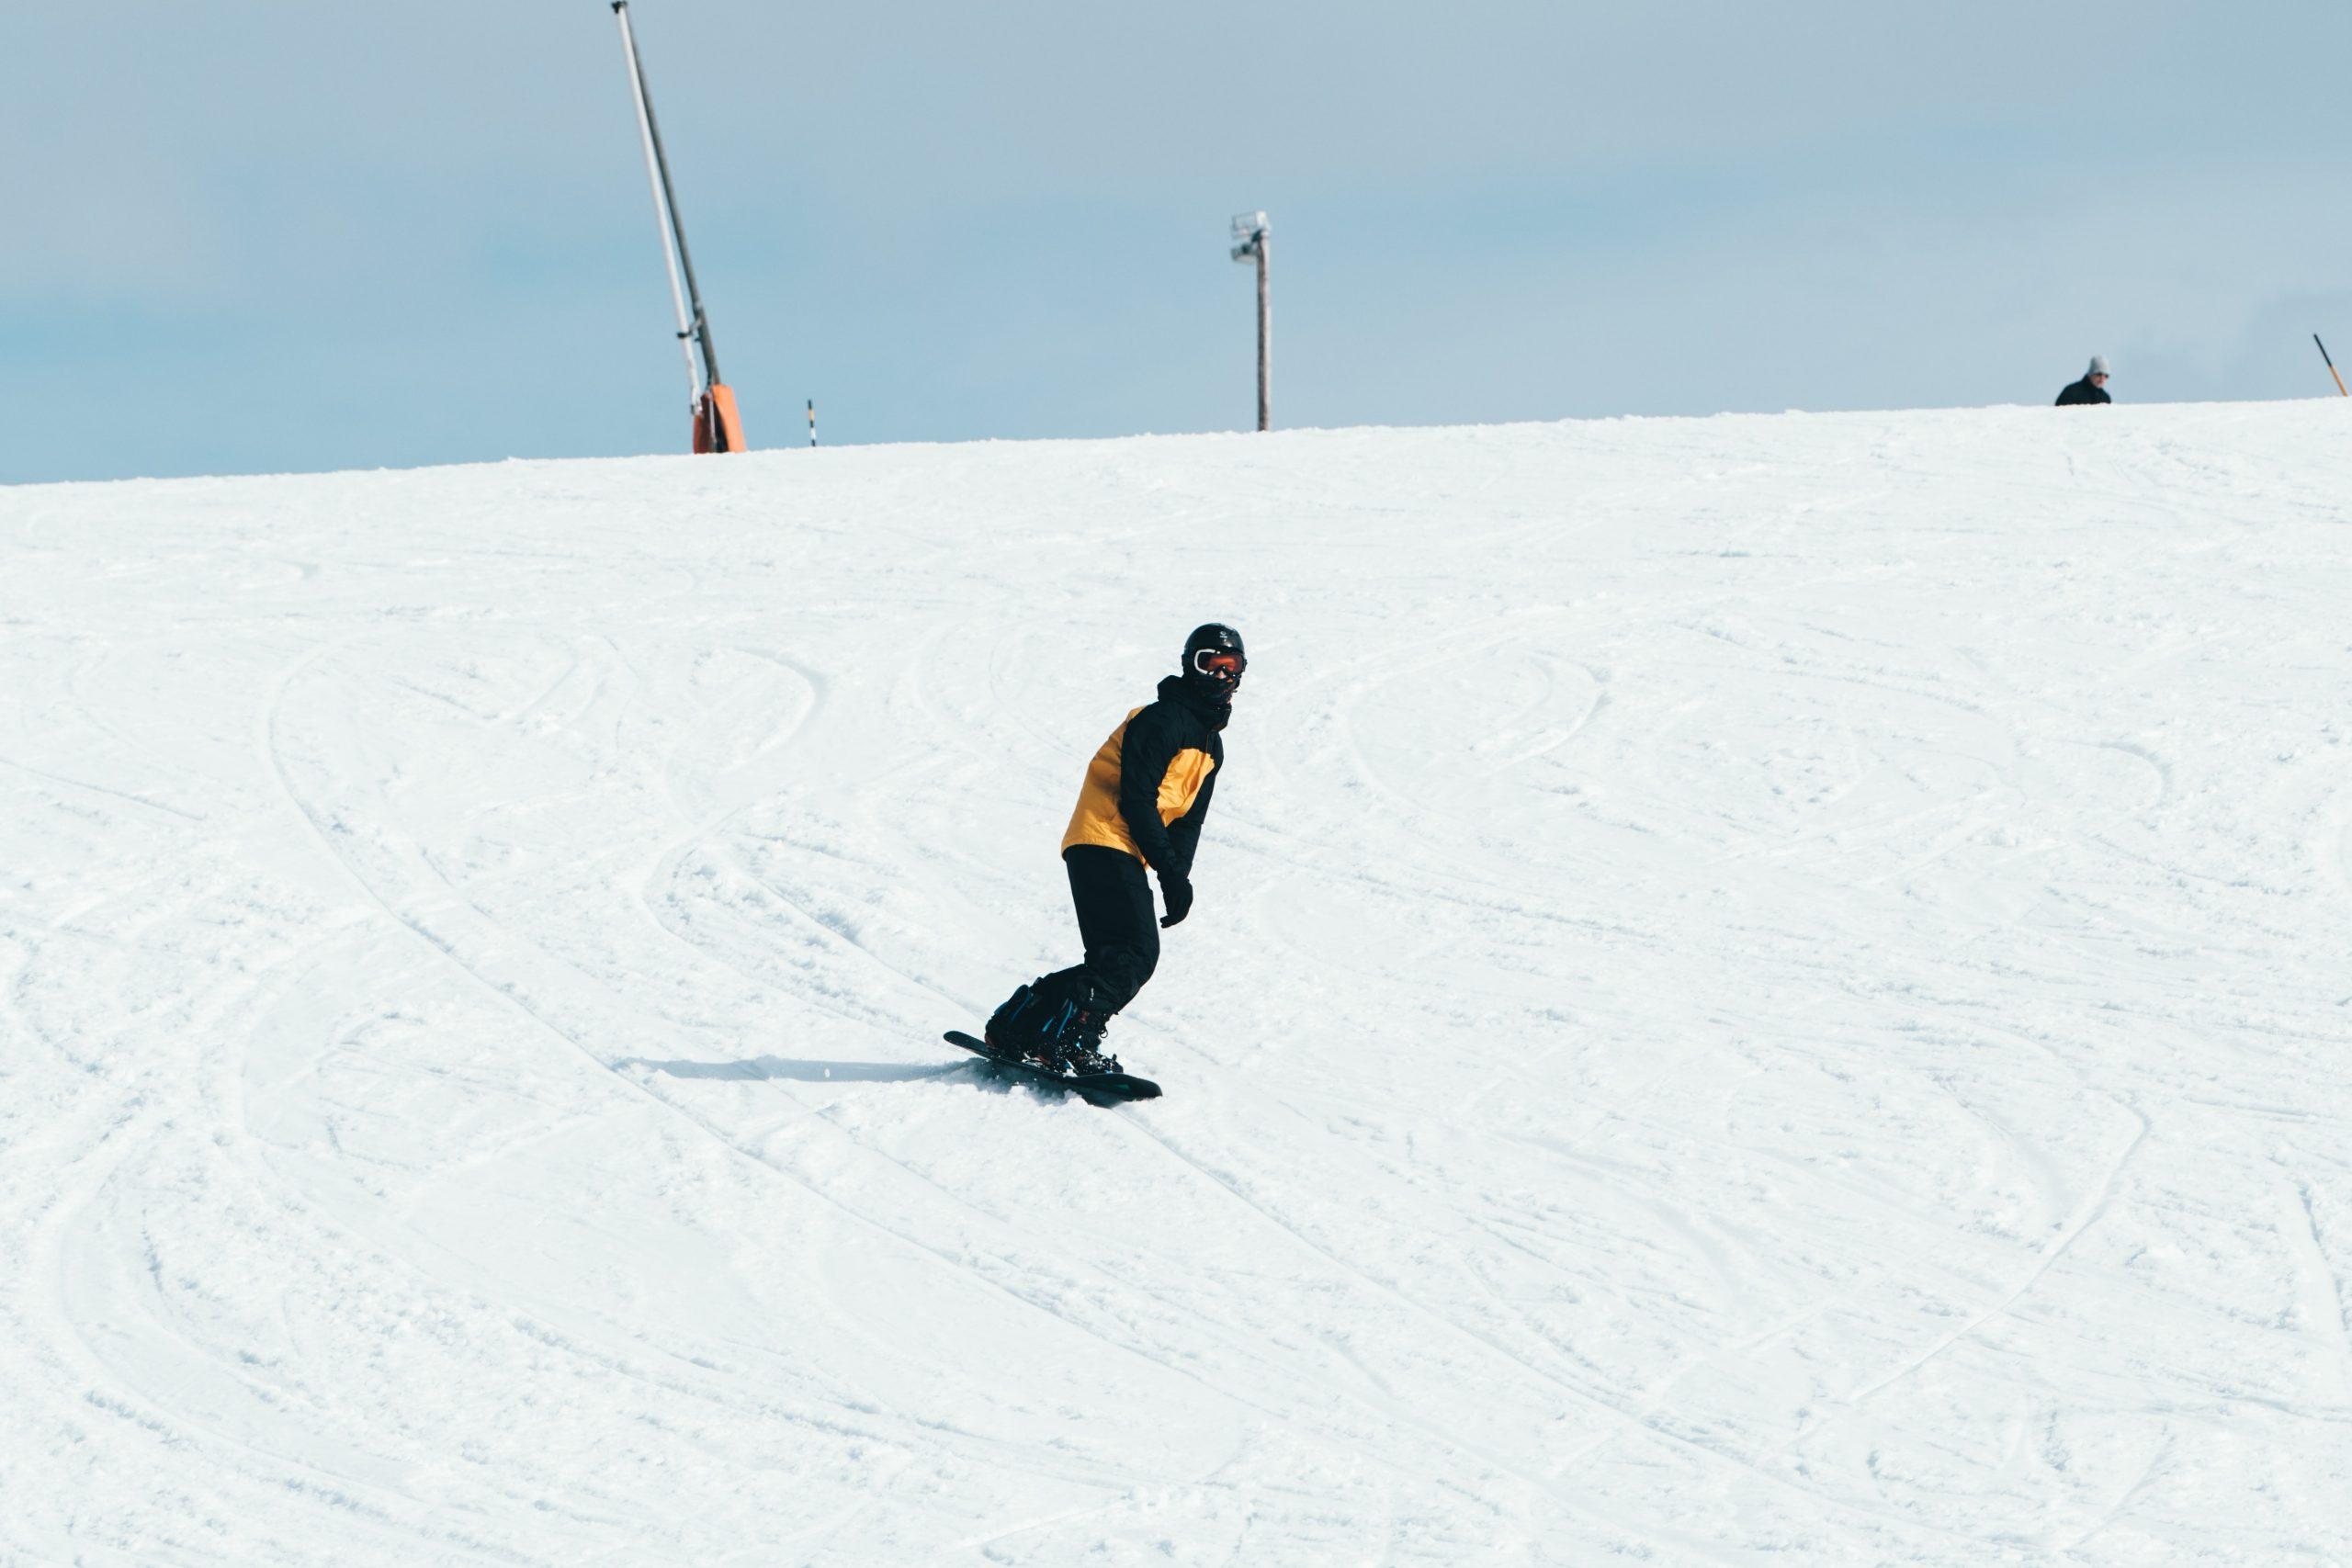 Snowboard Beginner on the Slope